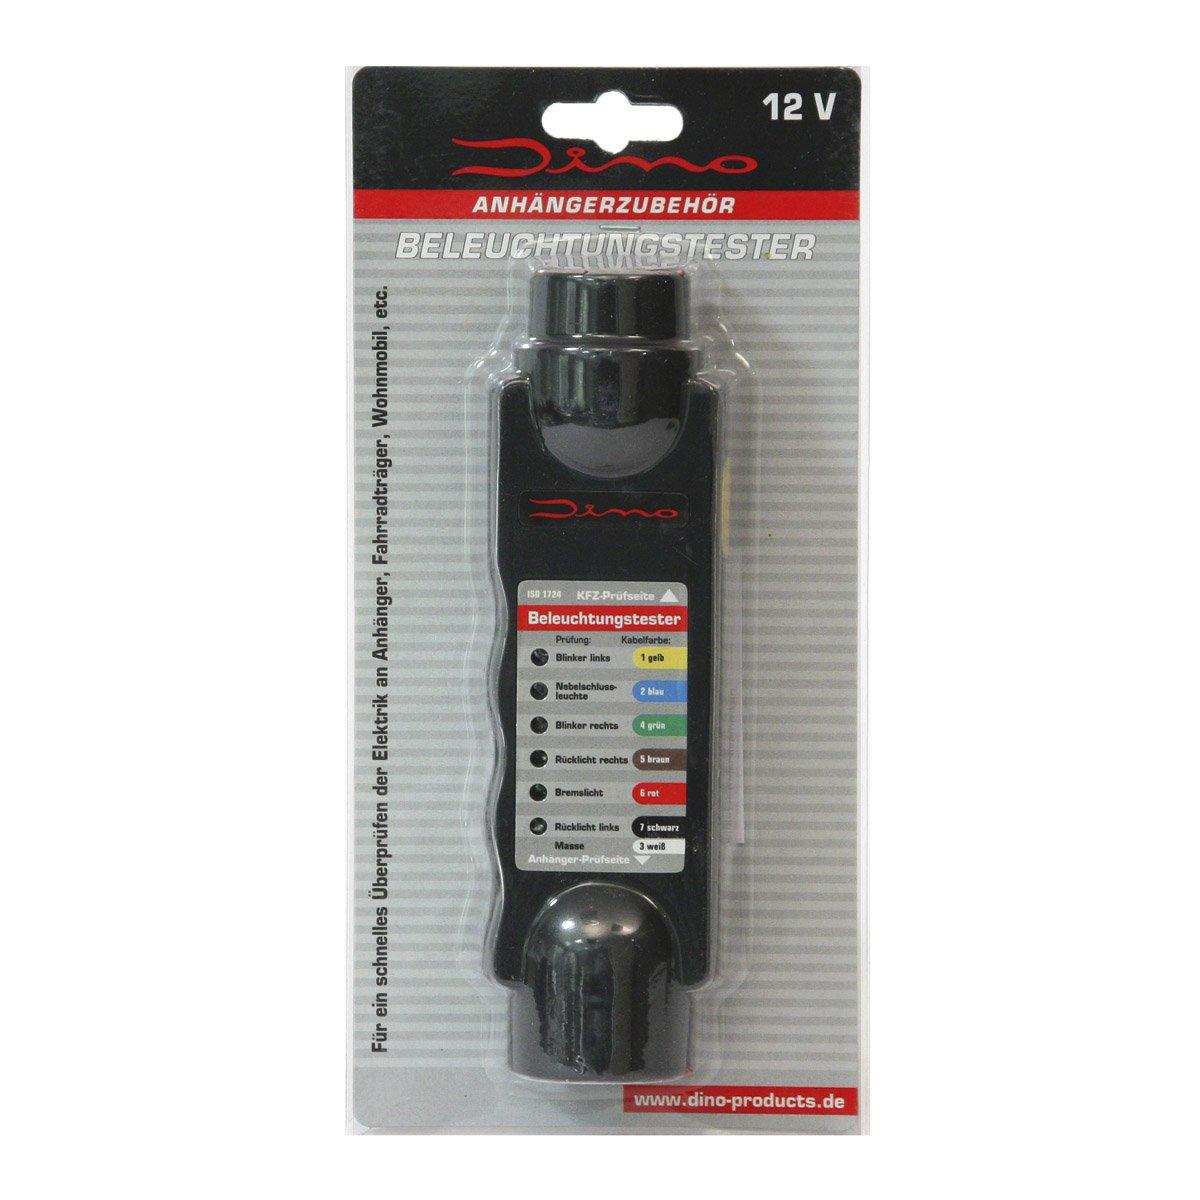 Dino Beleuchtungstester Prüfgerät Anhänger Stecker Adapter 7 13 polig 12 Volt